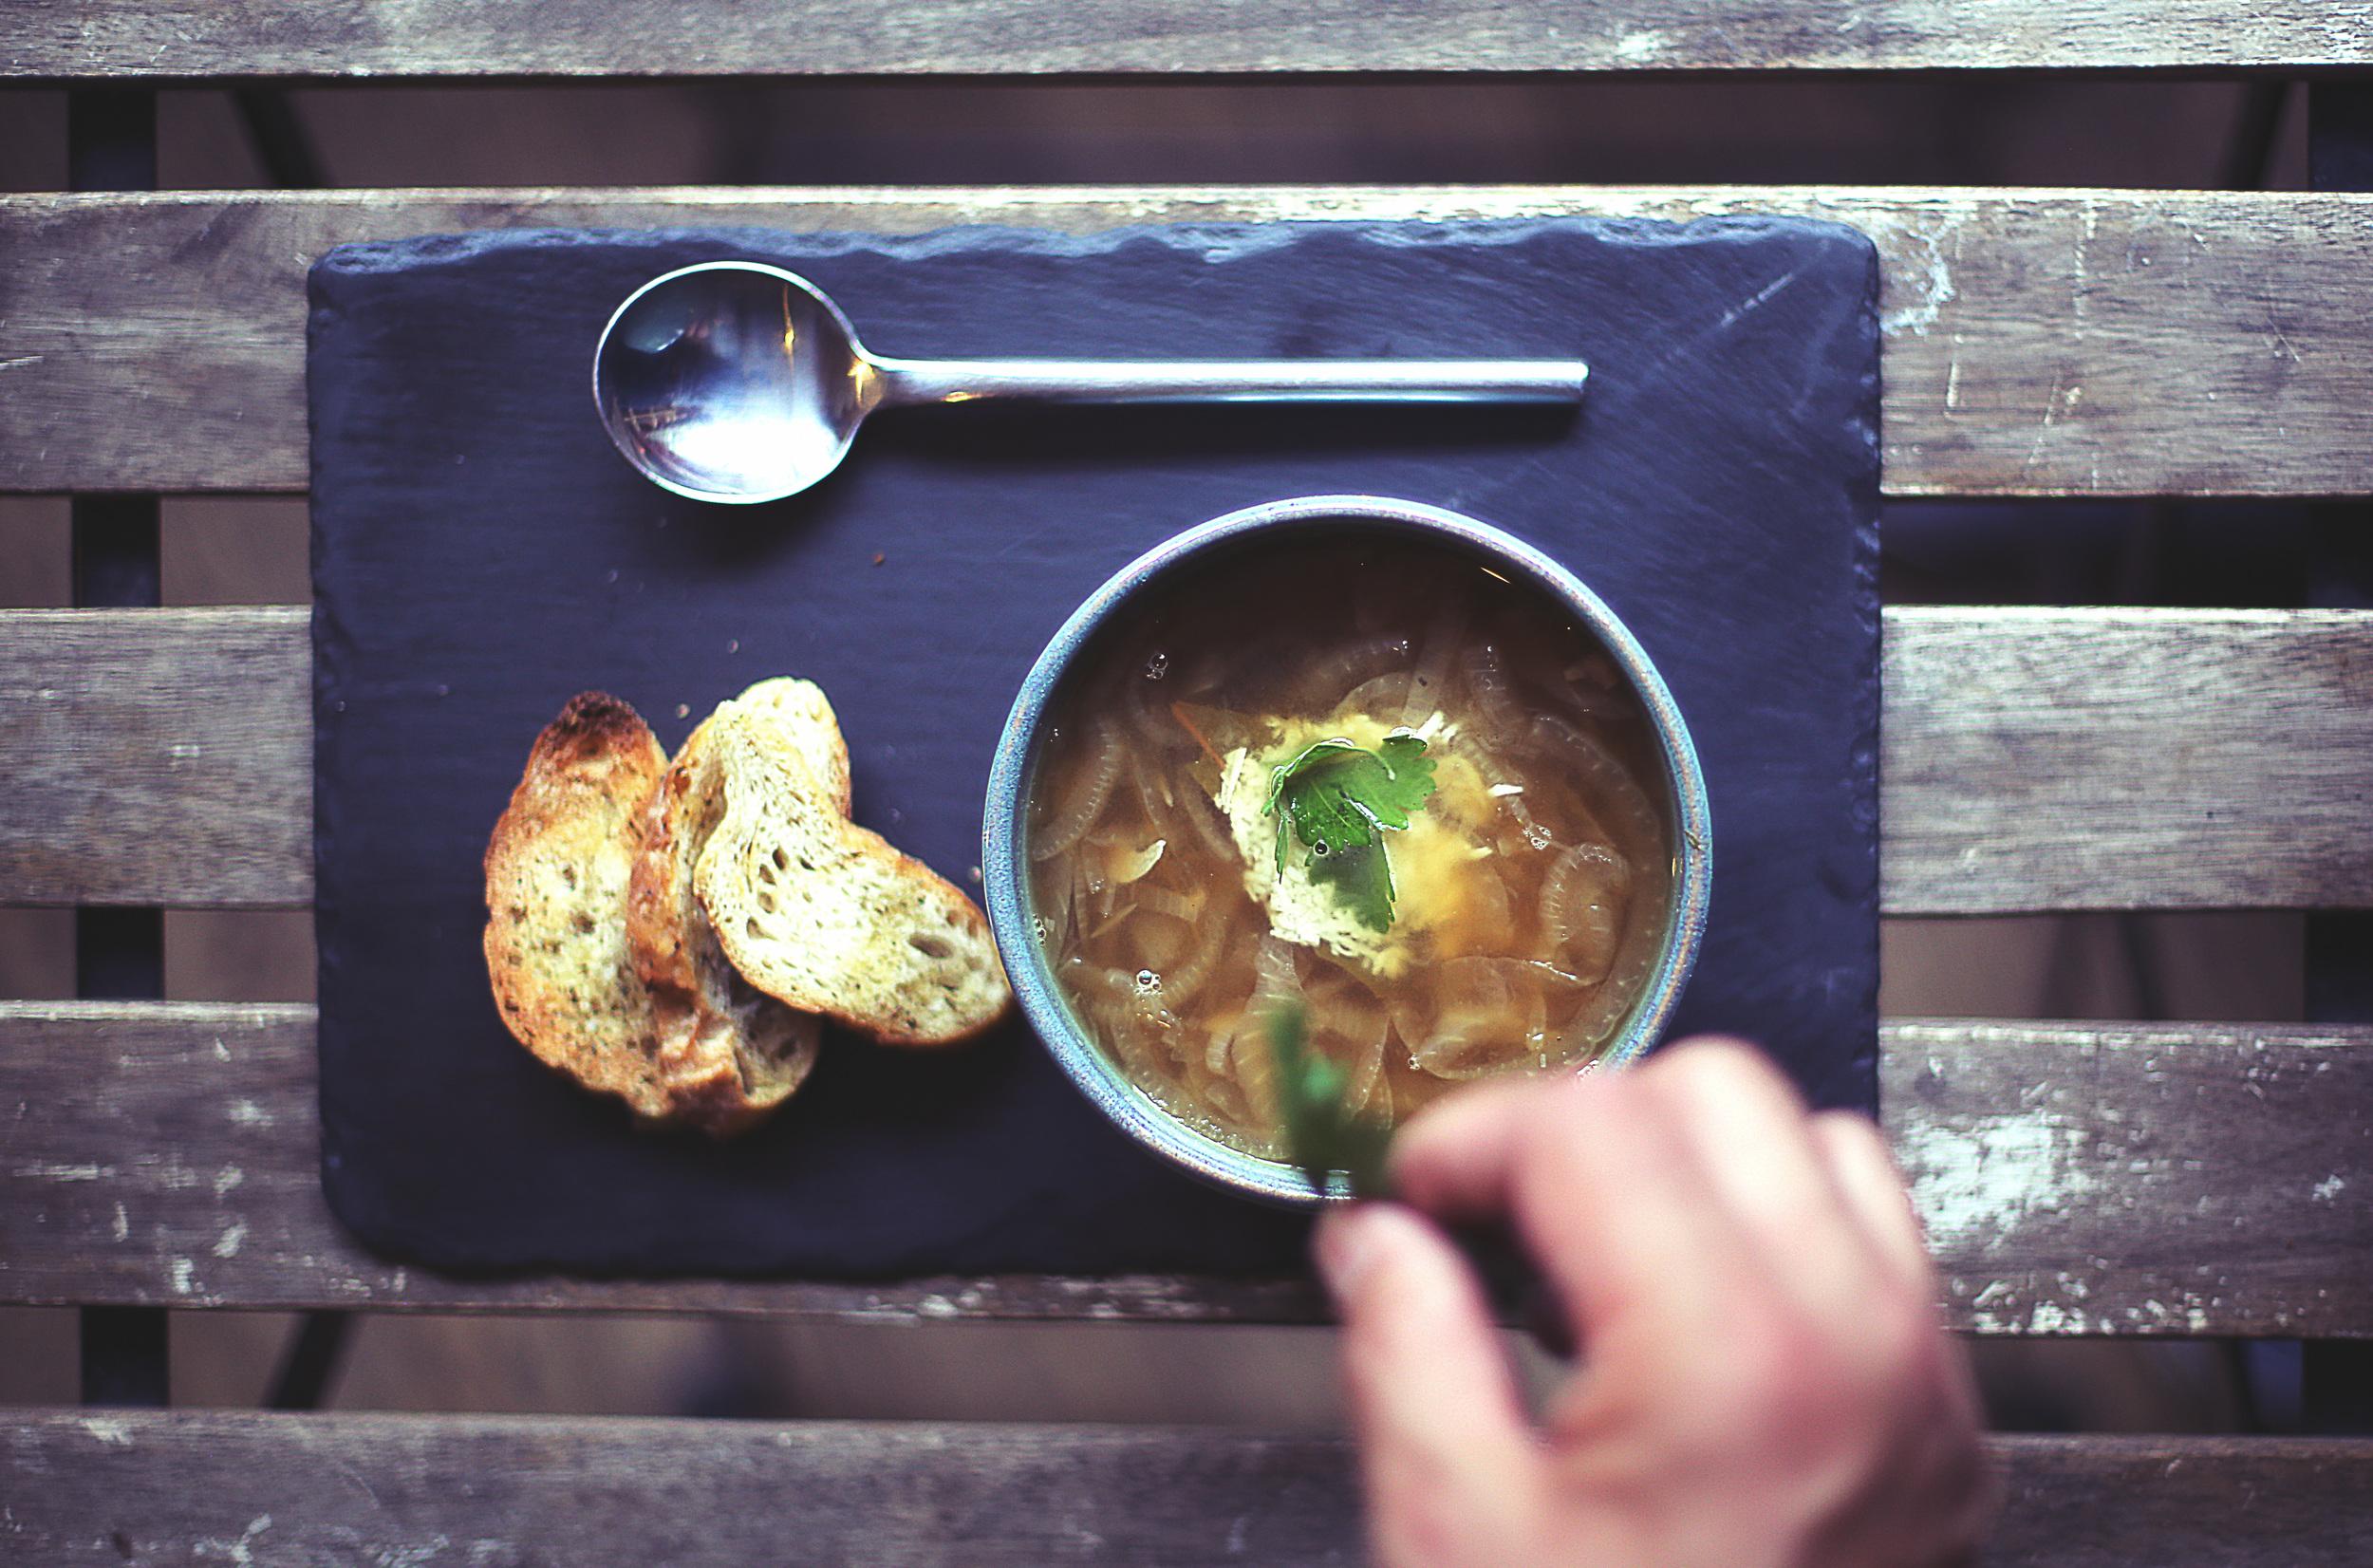 Freshly Prepared Soups & Sandwiches